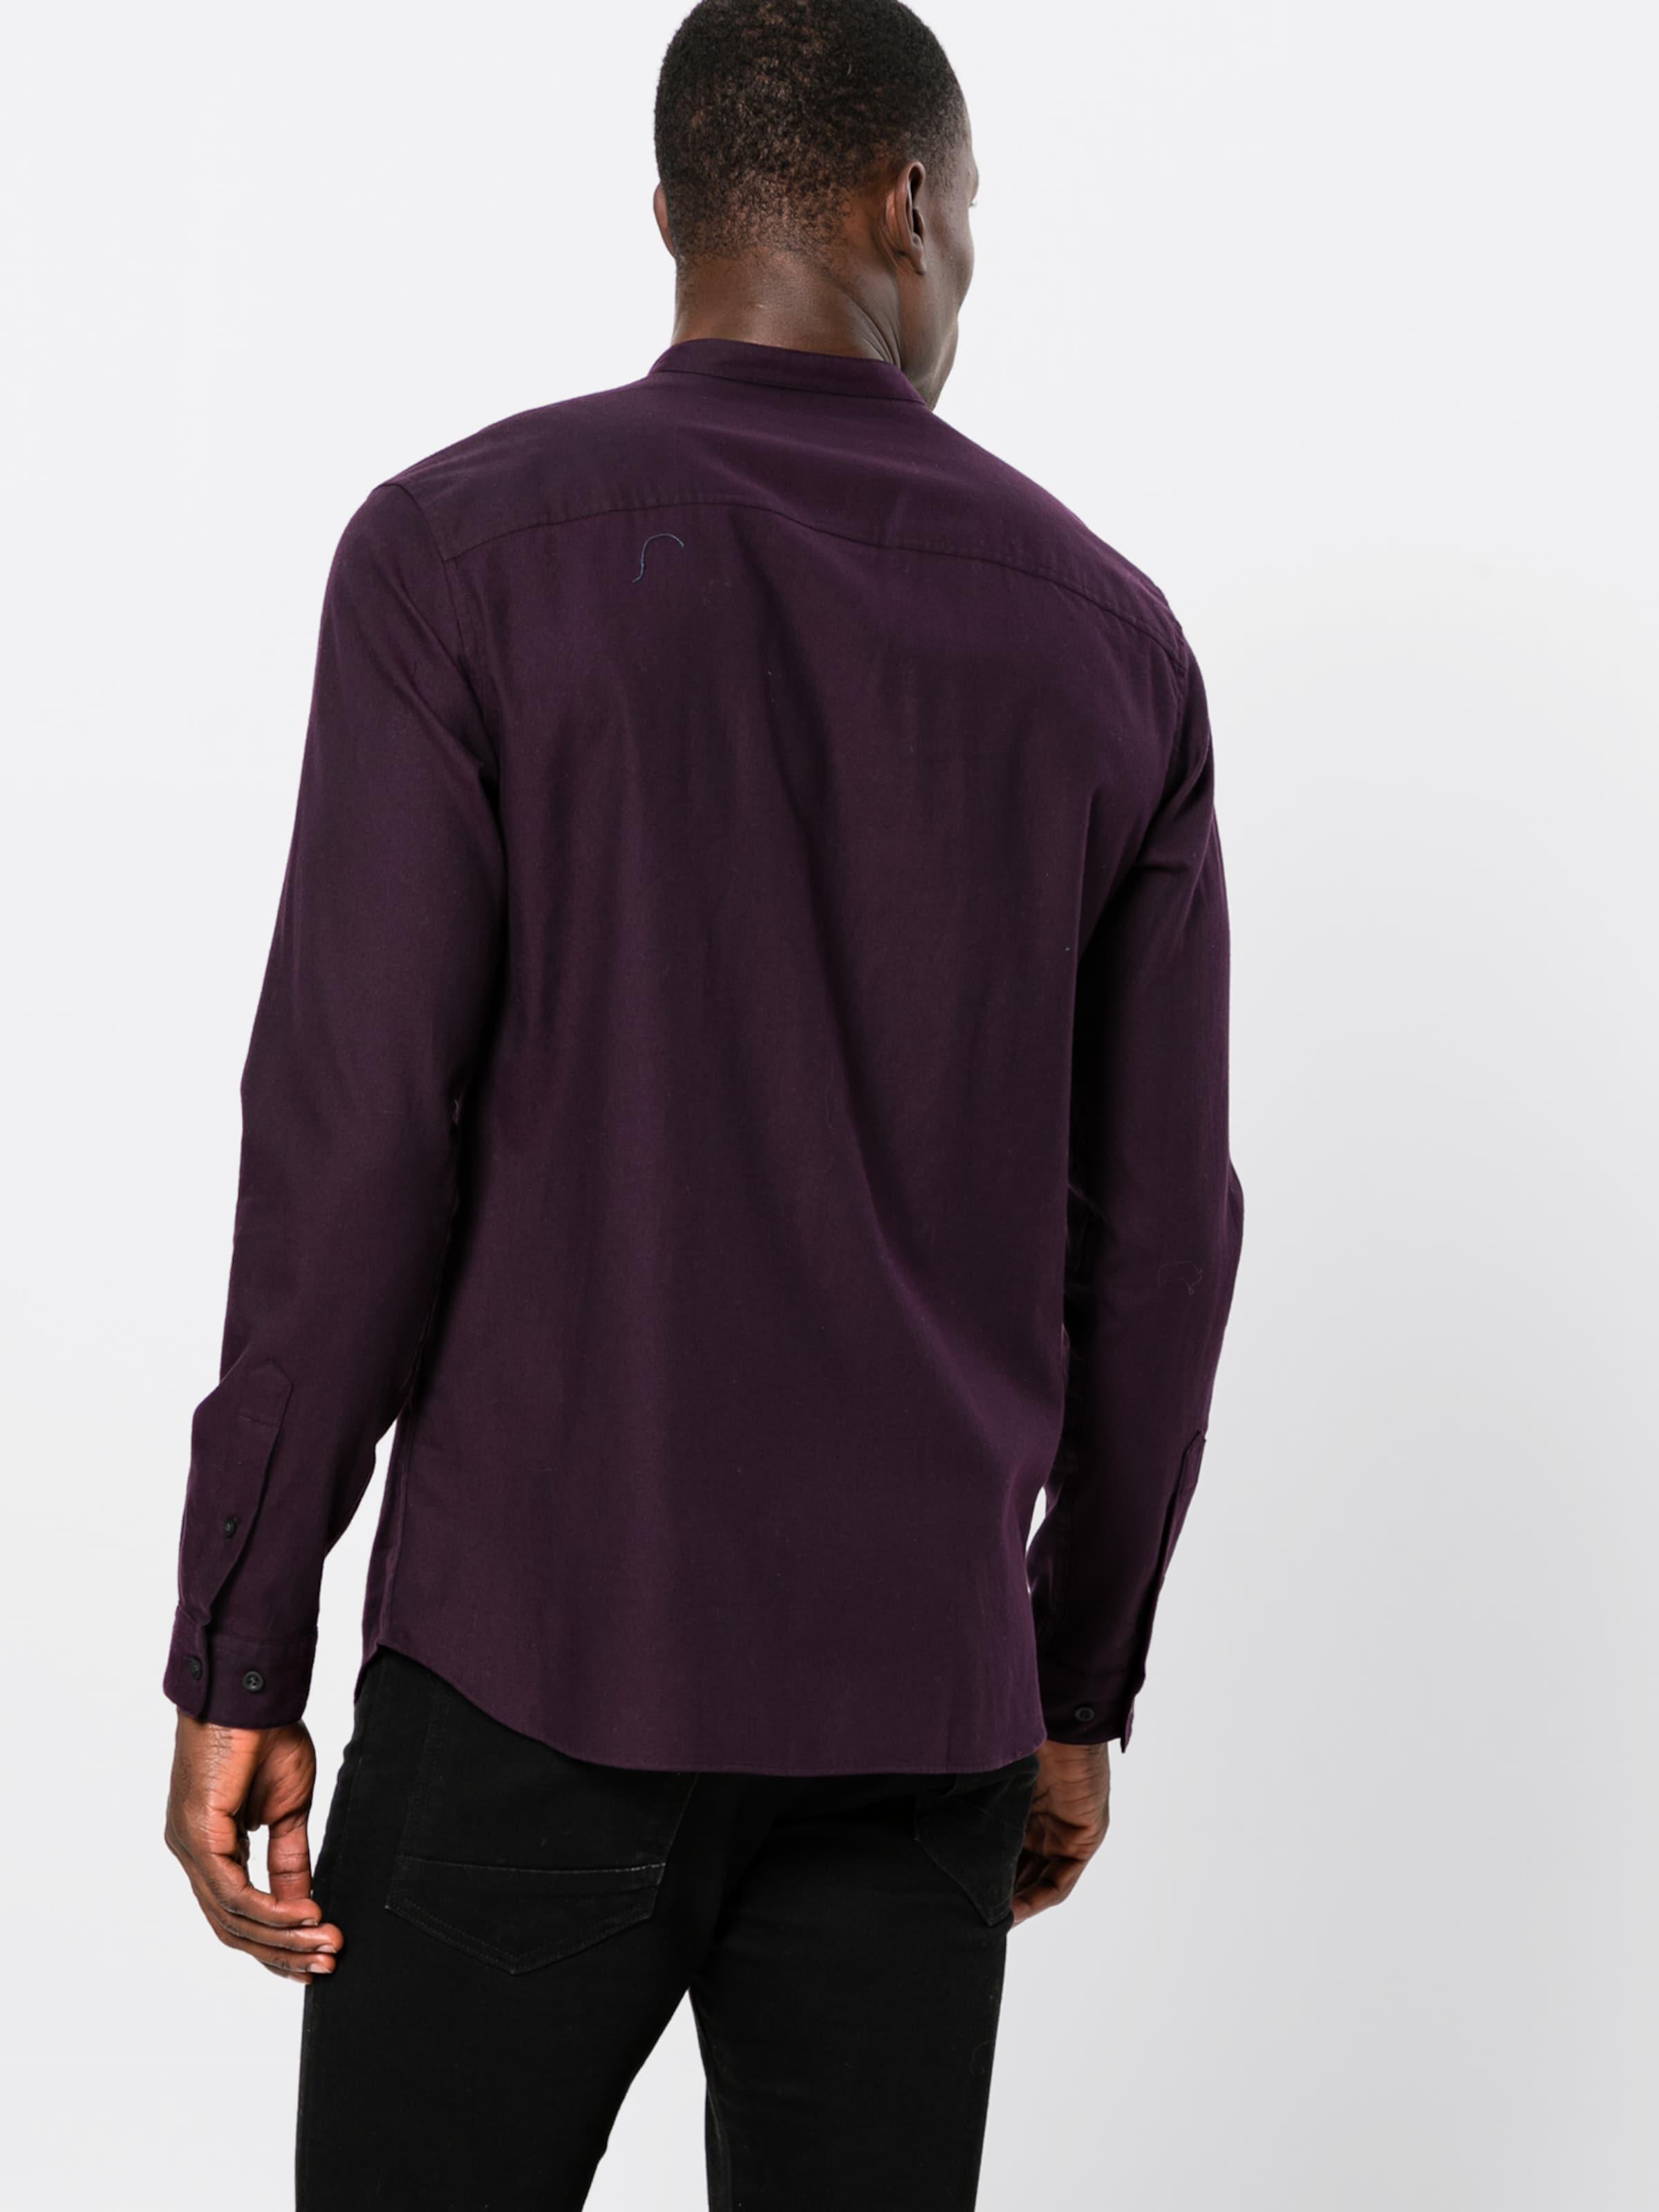 Mao s' Aubergine L Jones 'jprray Shirt Hemd Jackamp; In 0nv8Nwm